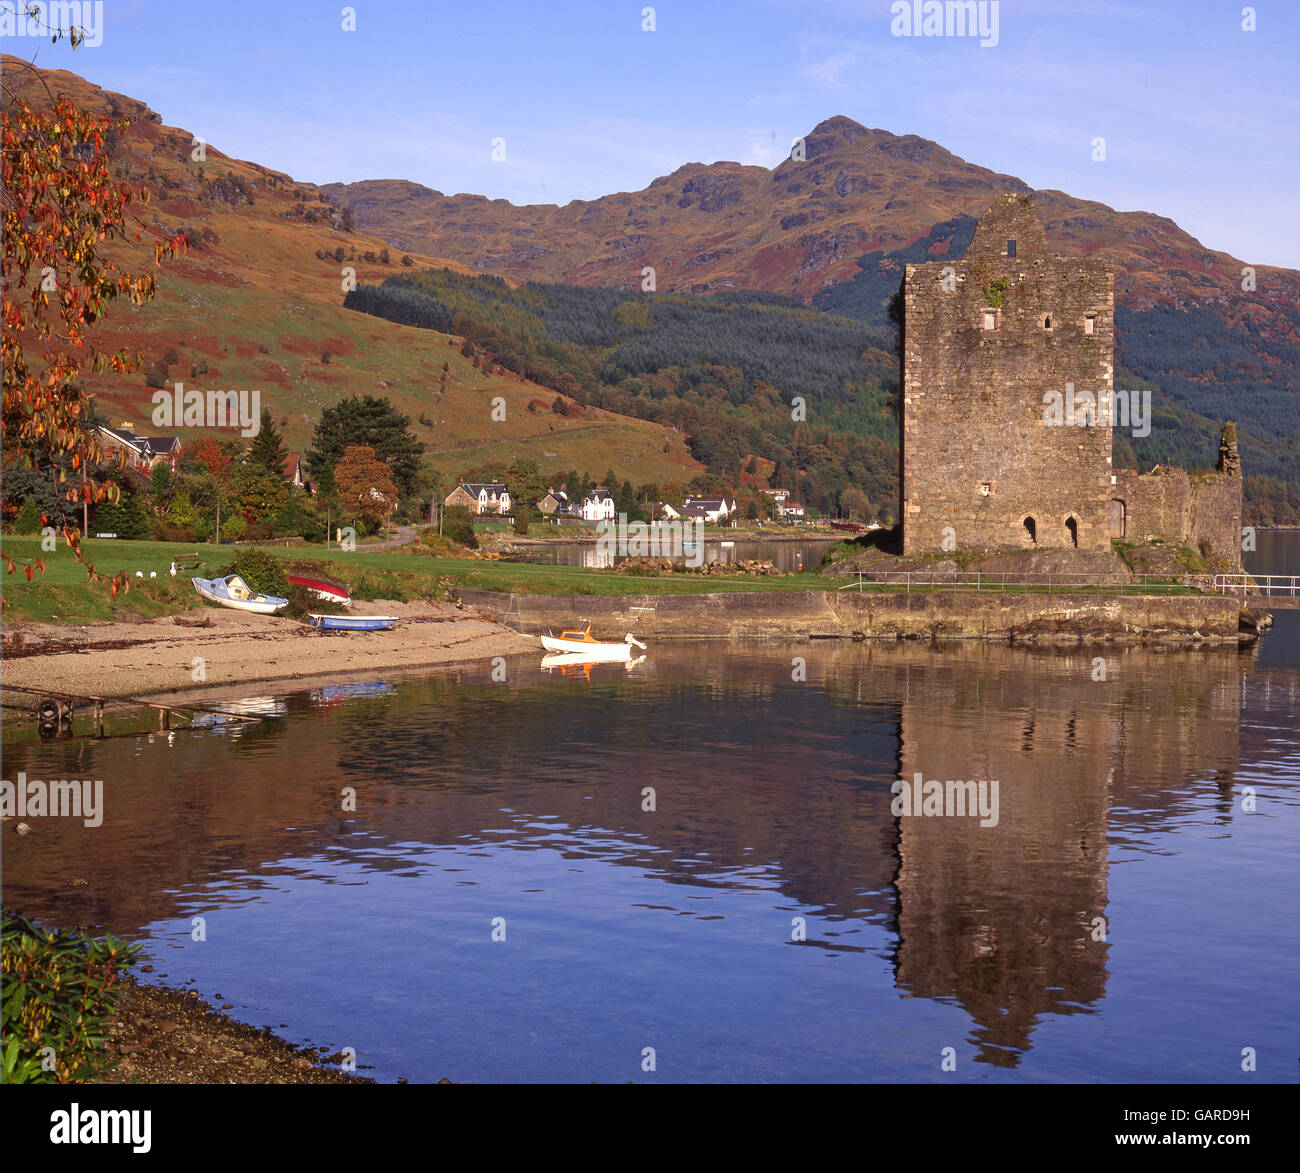 Carrick castle, Loch Goil, Lochgoilhead, Argyll - Stock Image